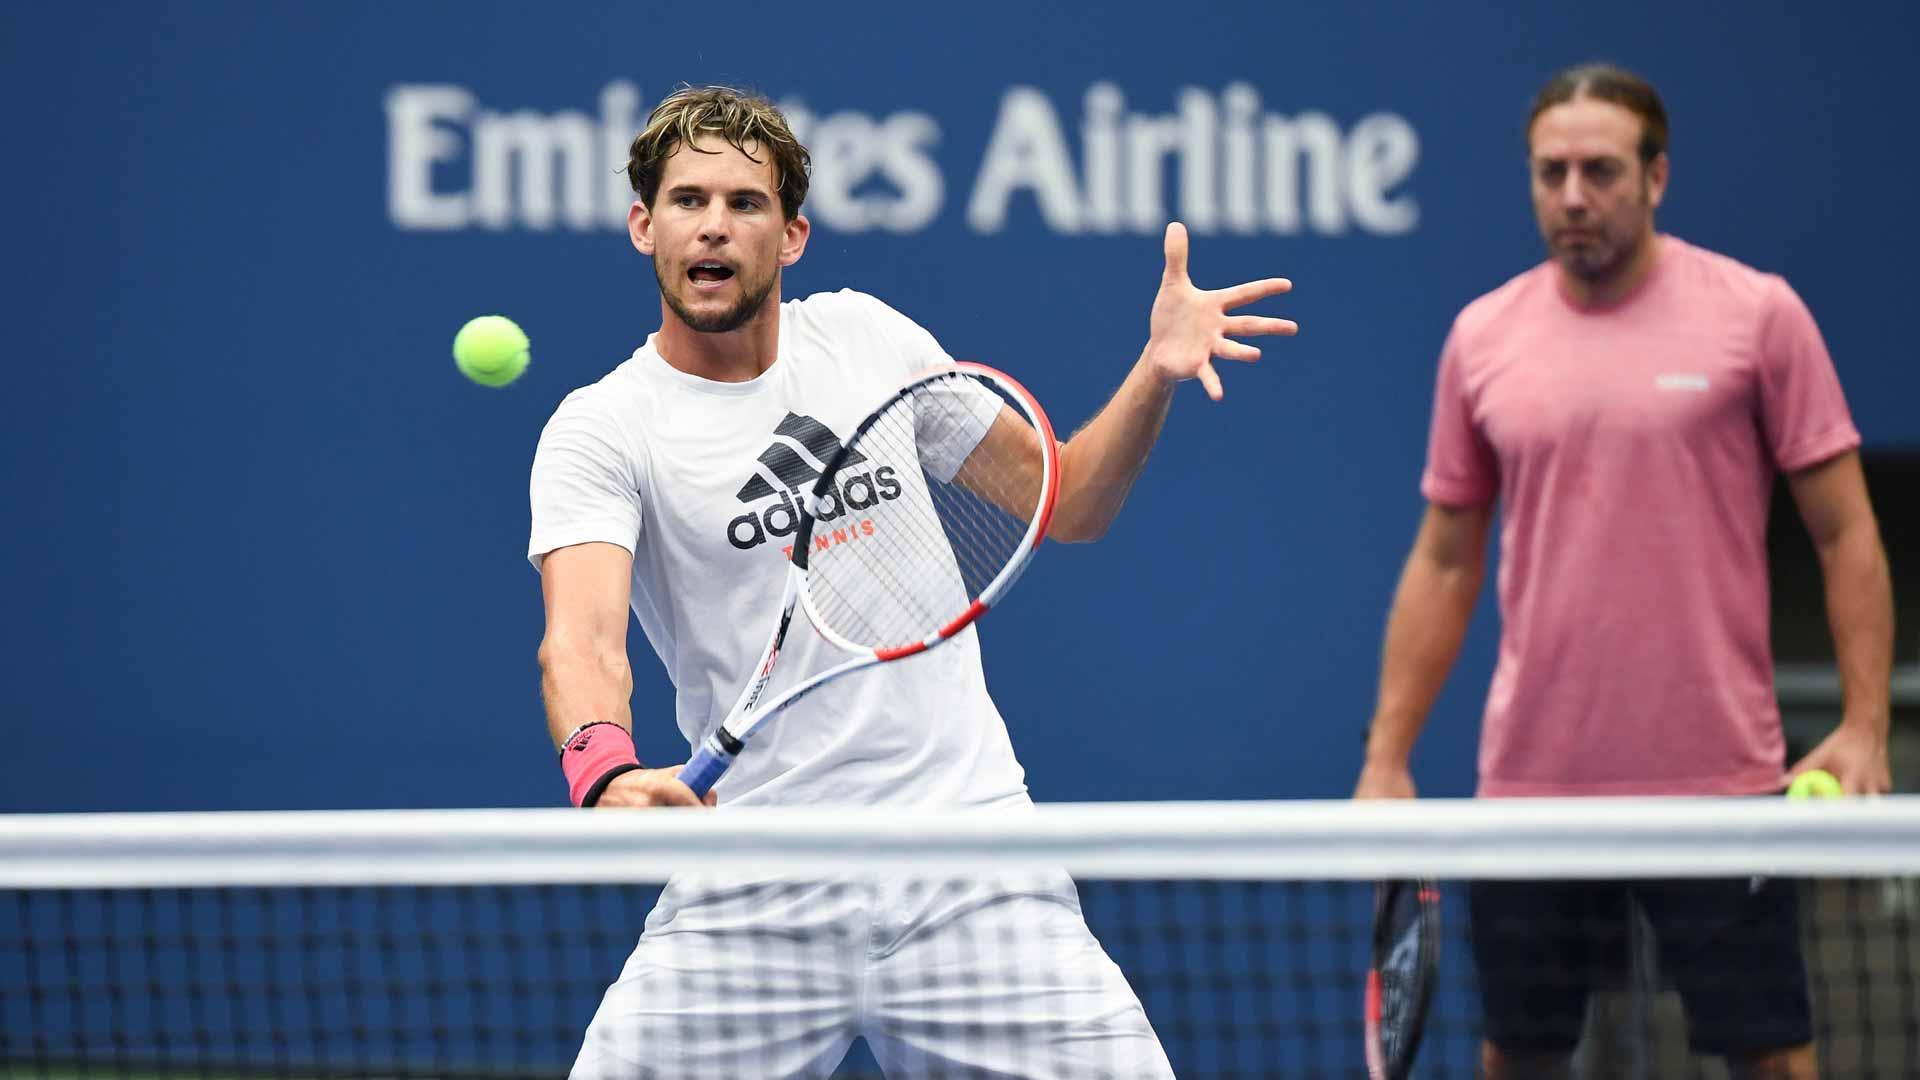 Djokovic sails through to quarters as Murray bows out